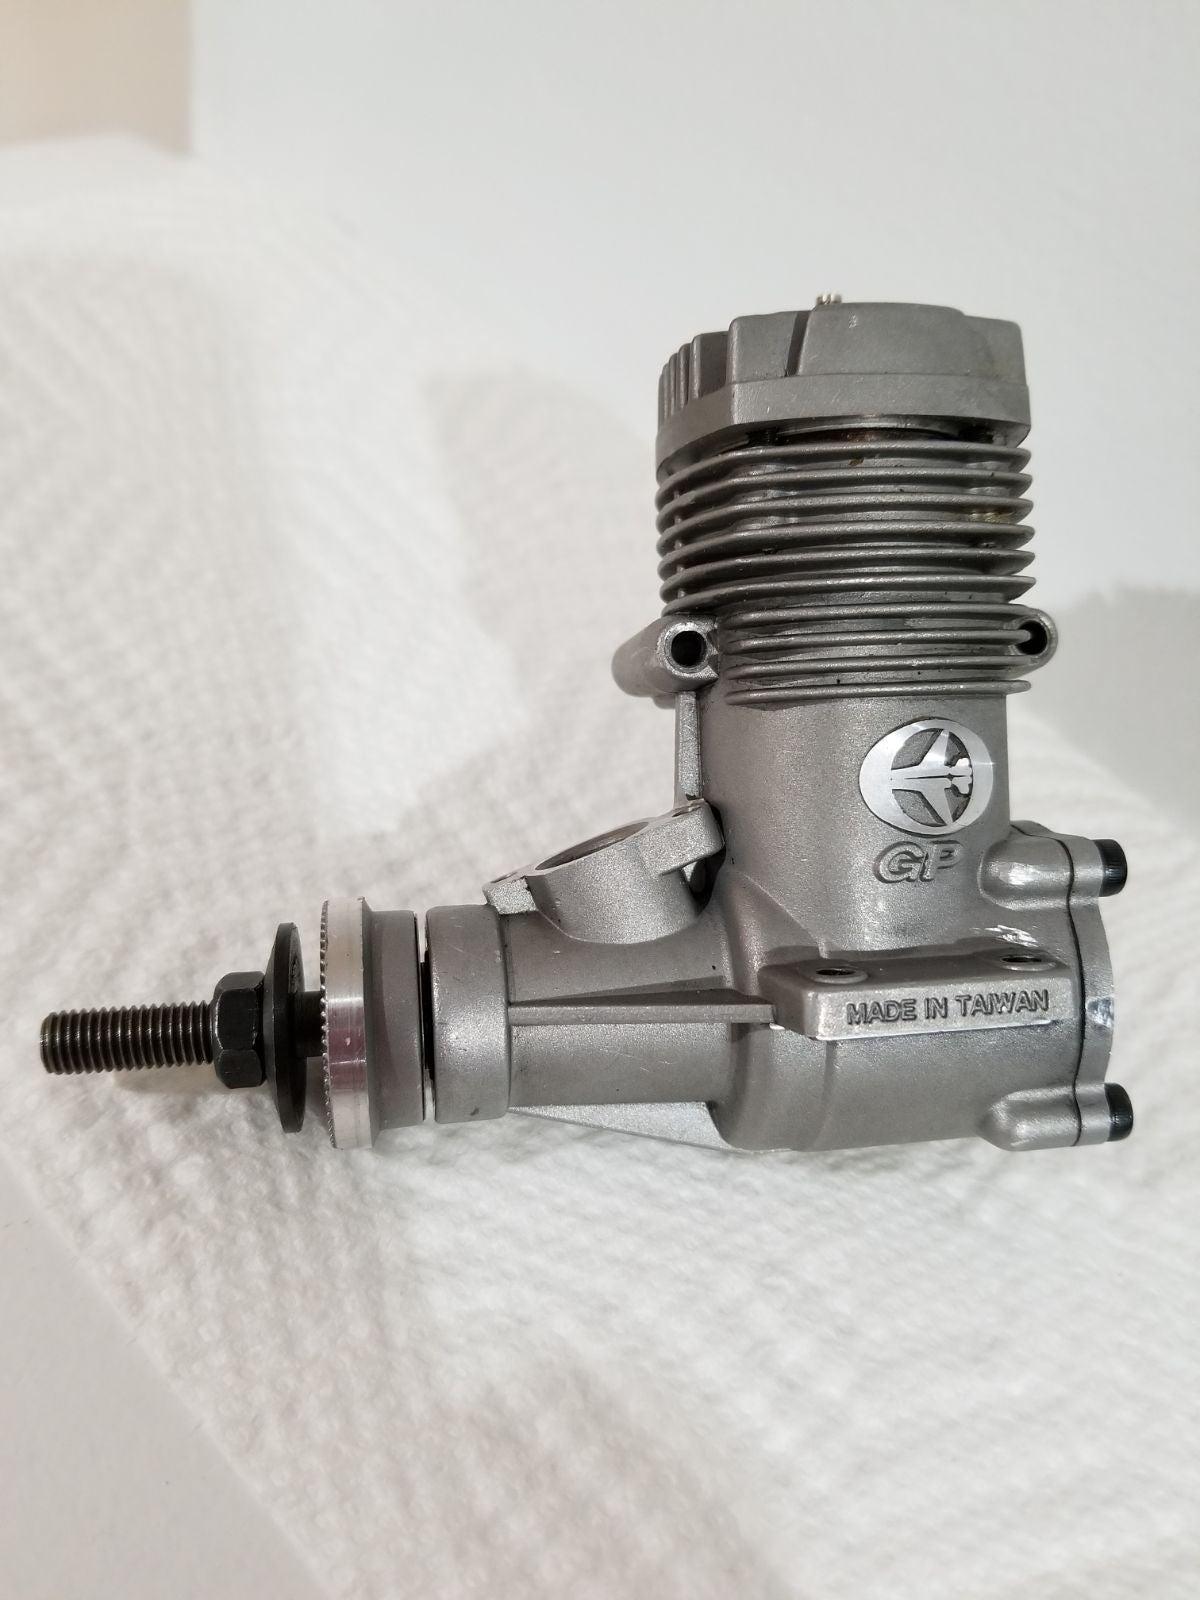 Thunder Tiger GP 42 RC Airplane Engine